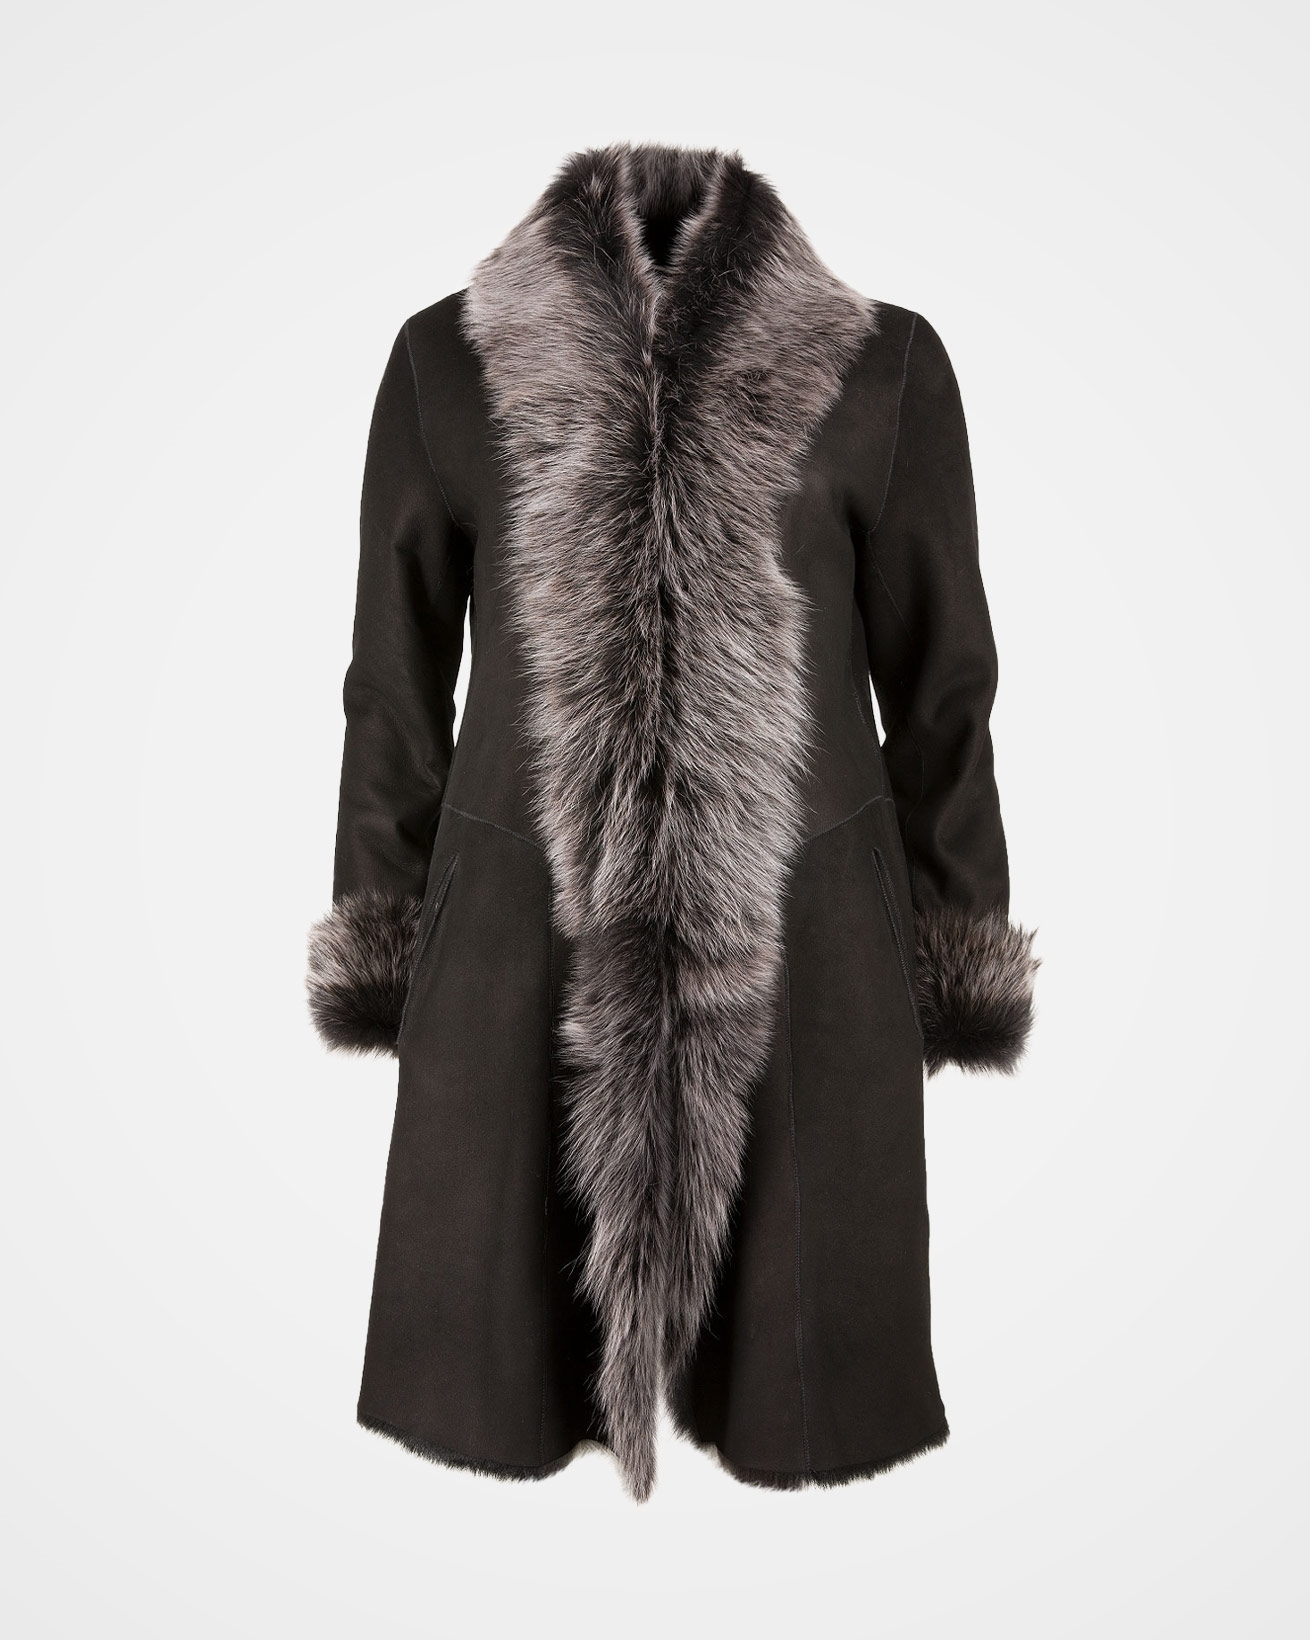 6020_3-4-toscana-trim-coat_black-snow-tip_front.jpg